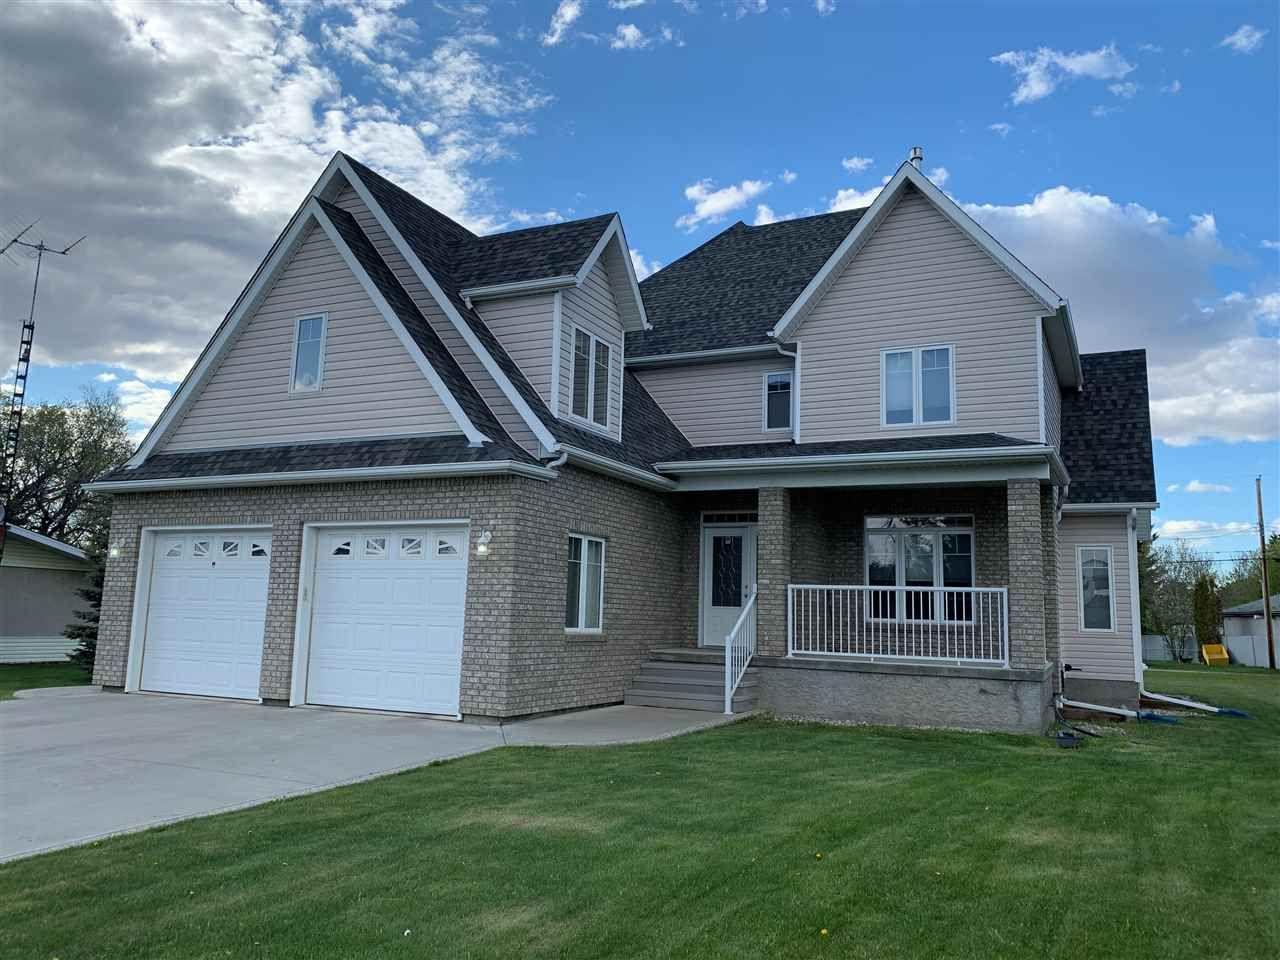 Main Photo: 10724 102 Street: Westlock House for sale : MLS®# E4200070